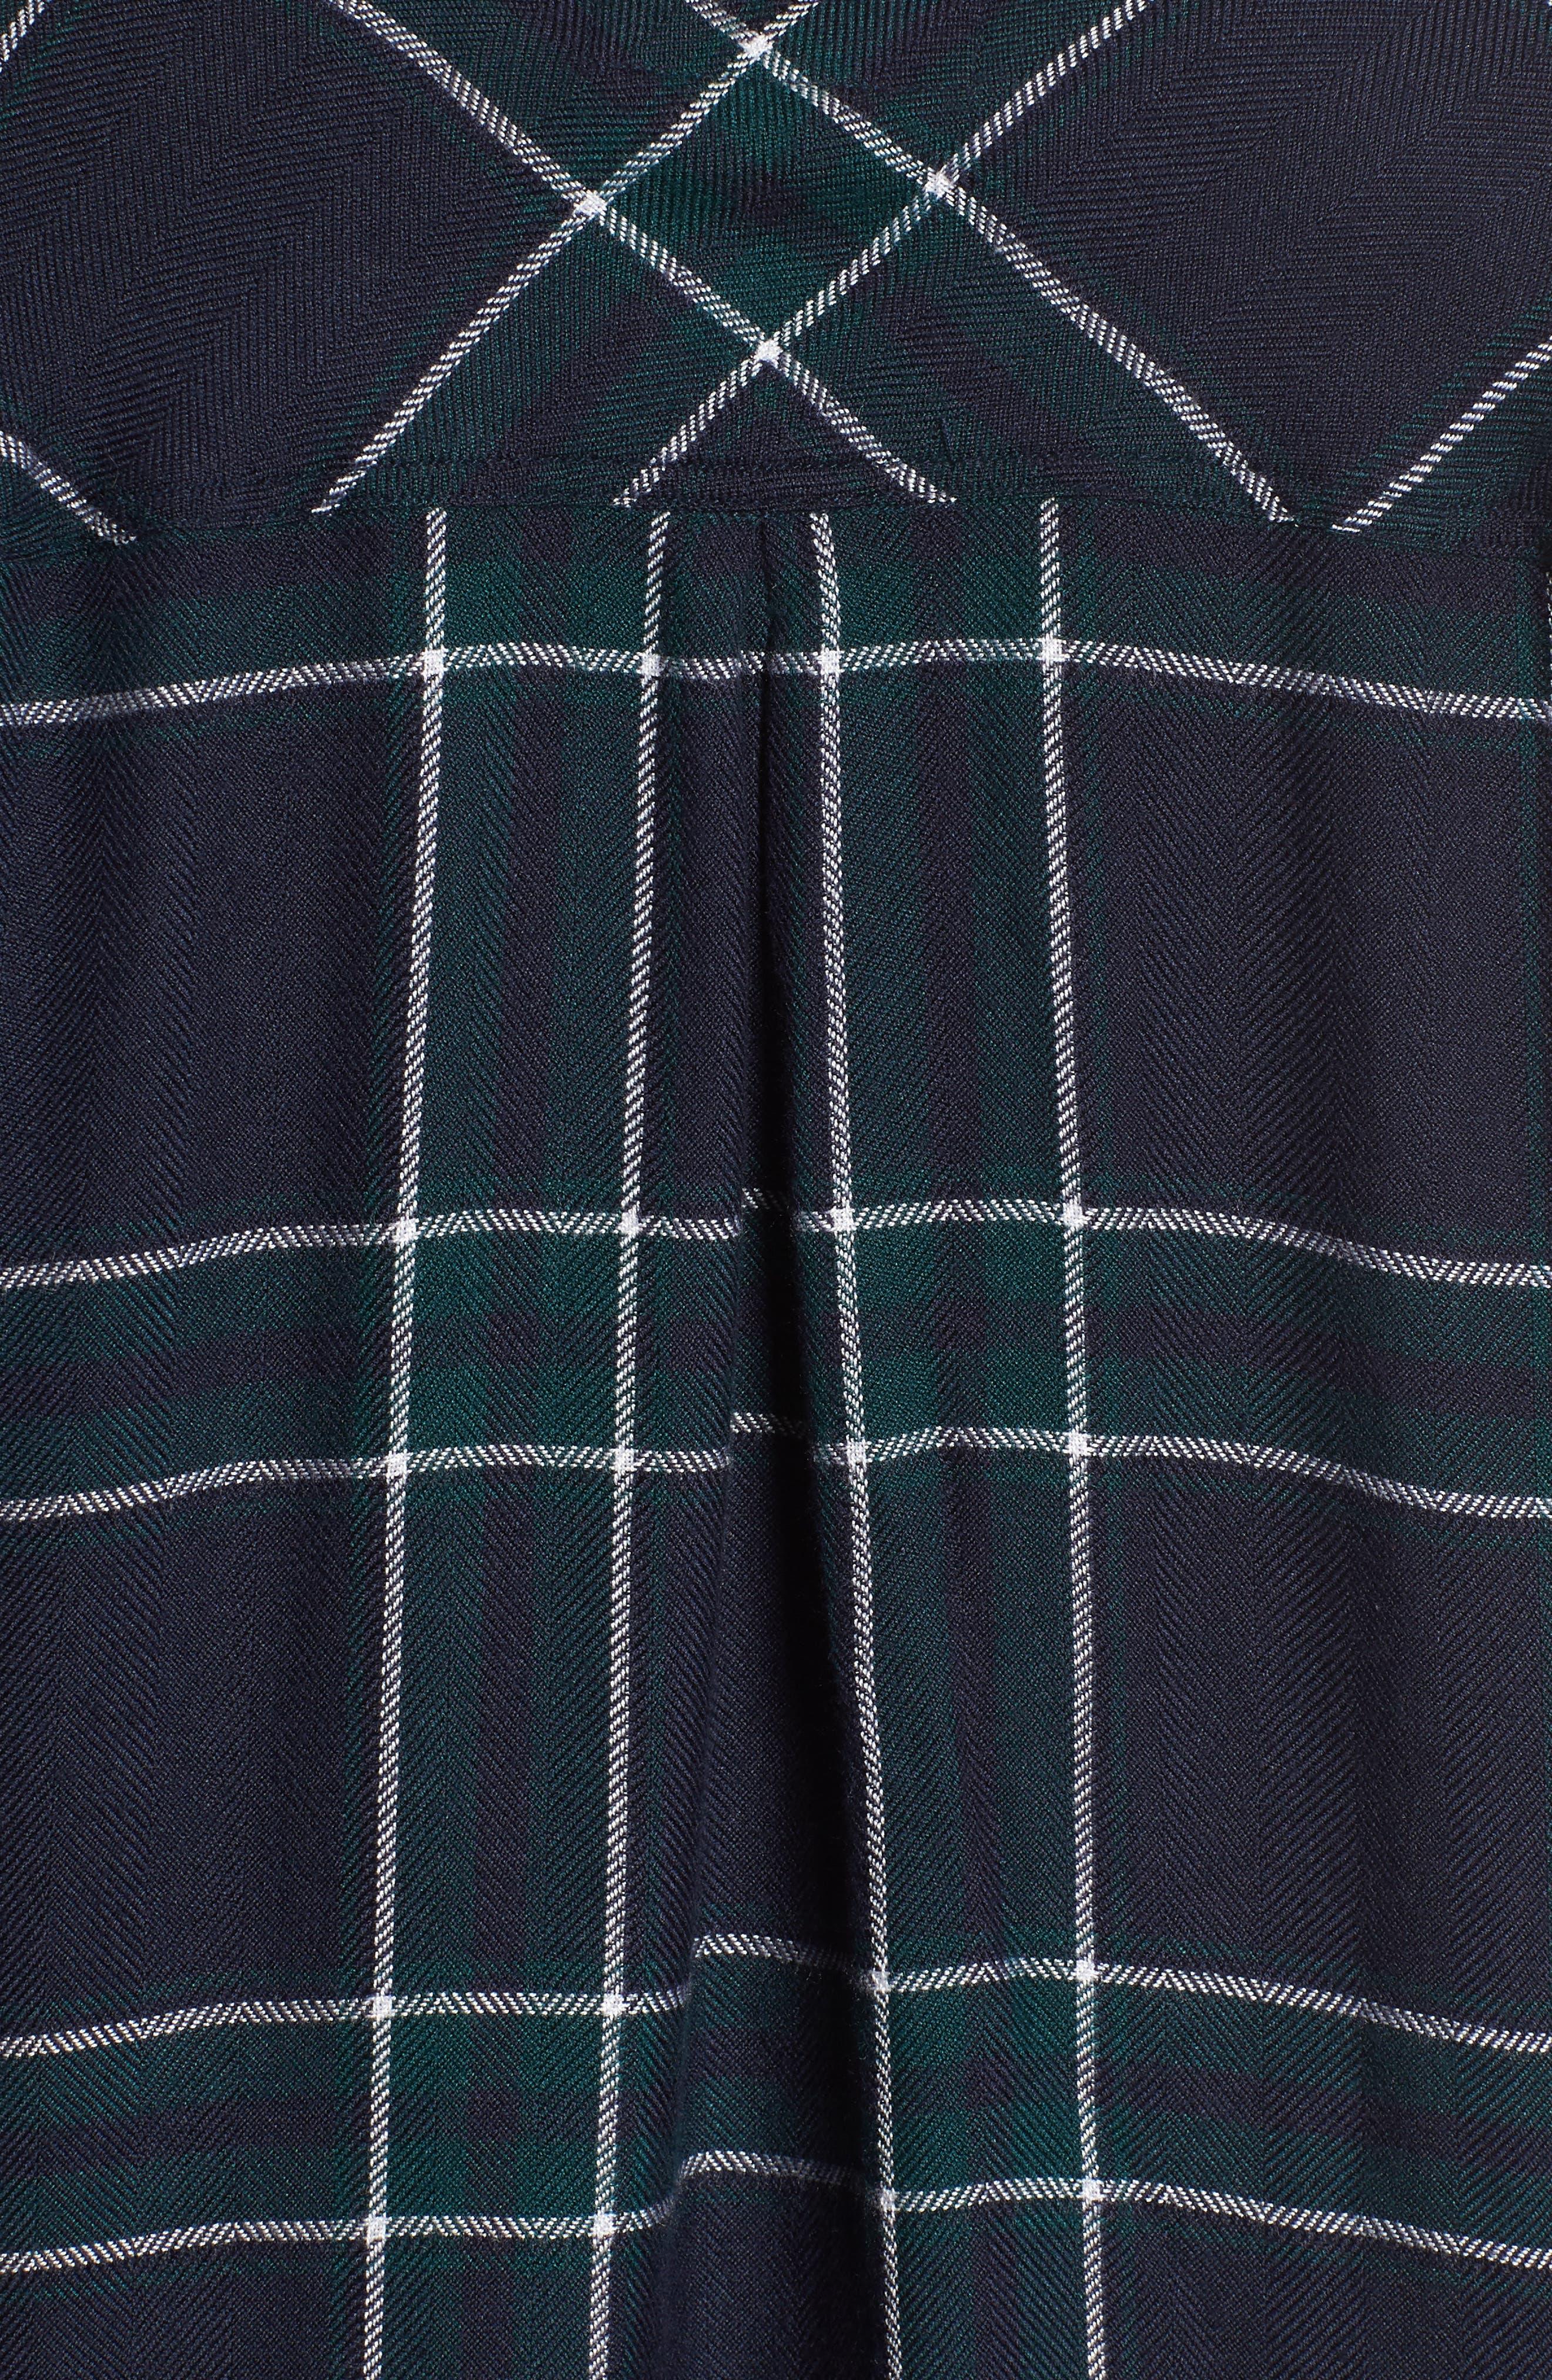 Hunter Plaid Shirt,                             Alternate thumbnail 6, color,                             MIDNIGHT FOREST WHITE